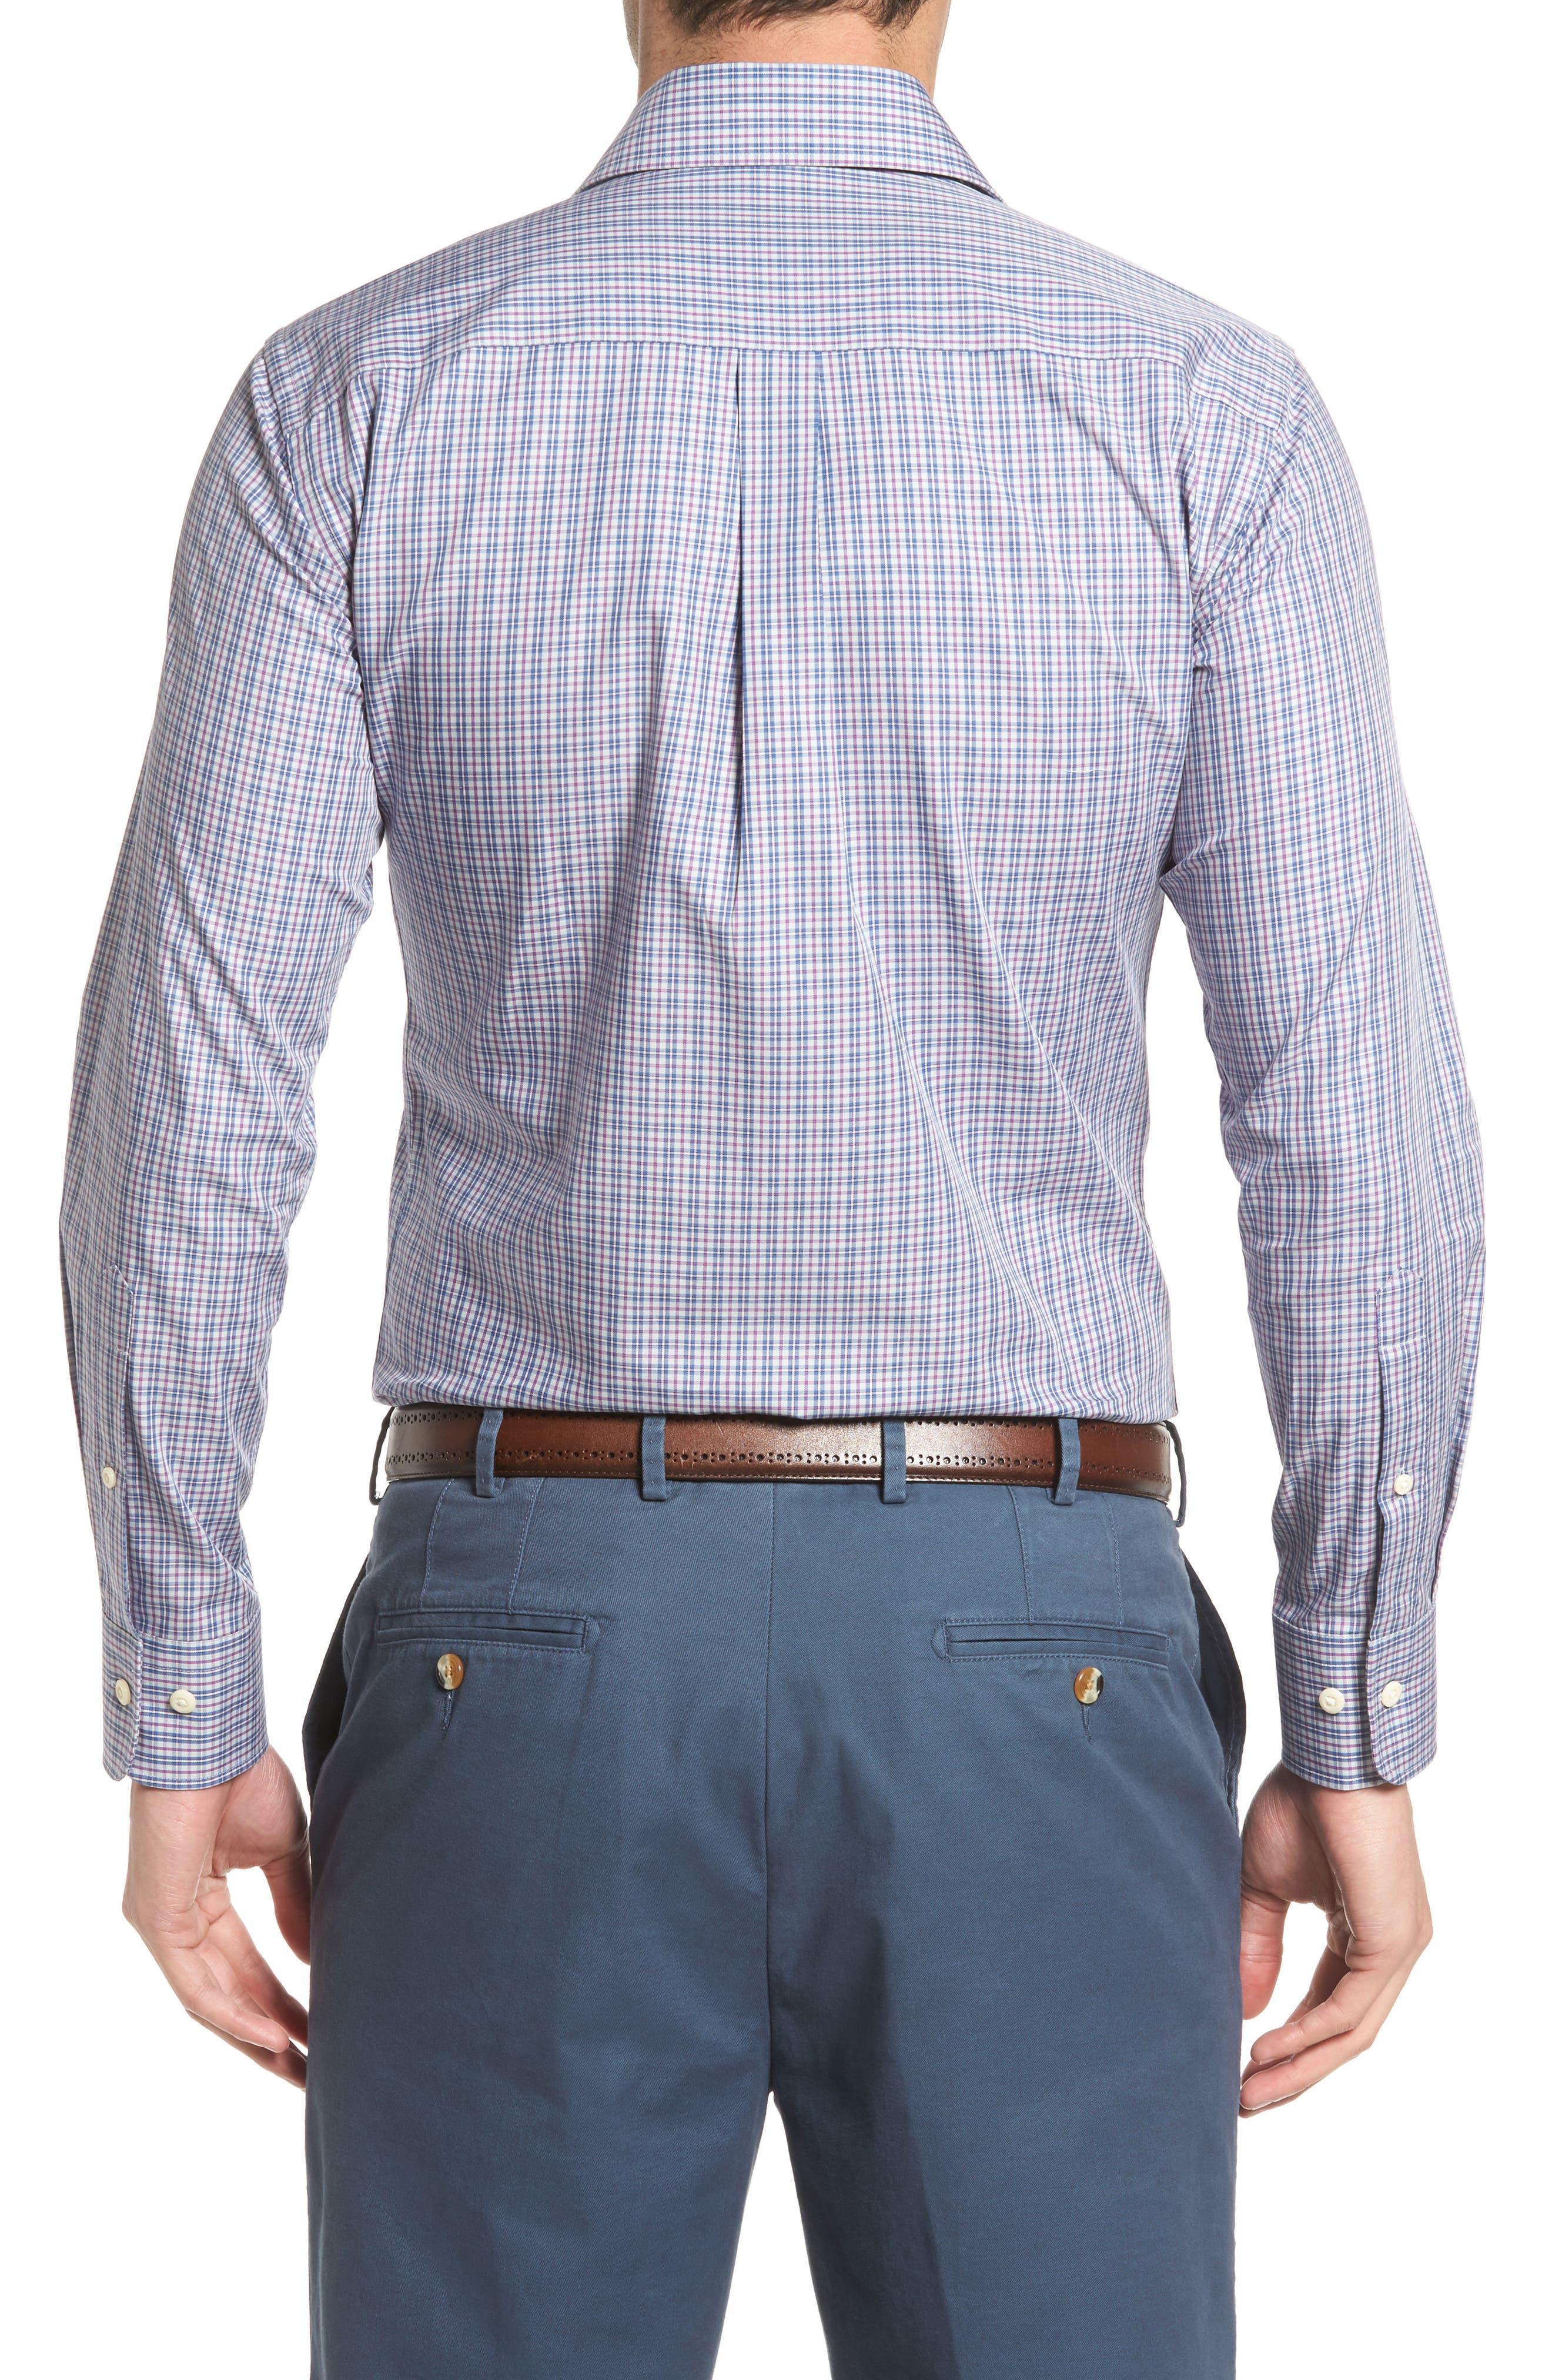 Alternate Image 2  - Peter Millar Hillock Plaid Regular Fit Sport Shirt